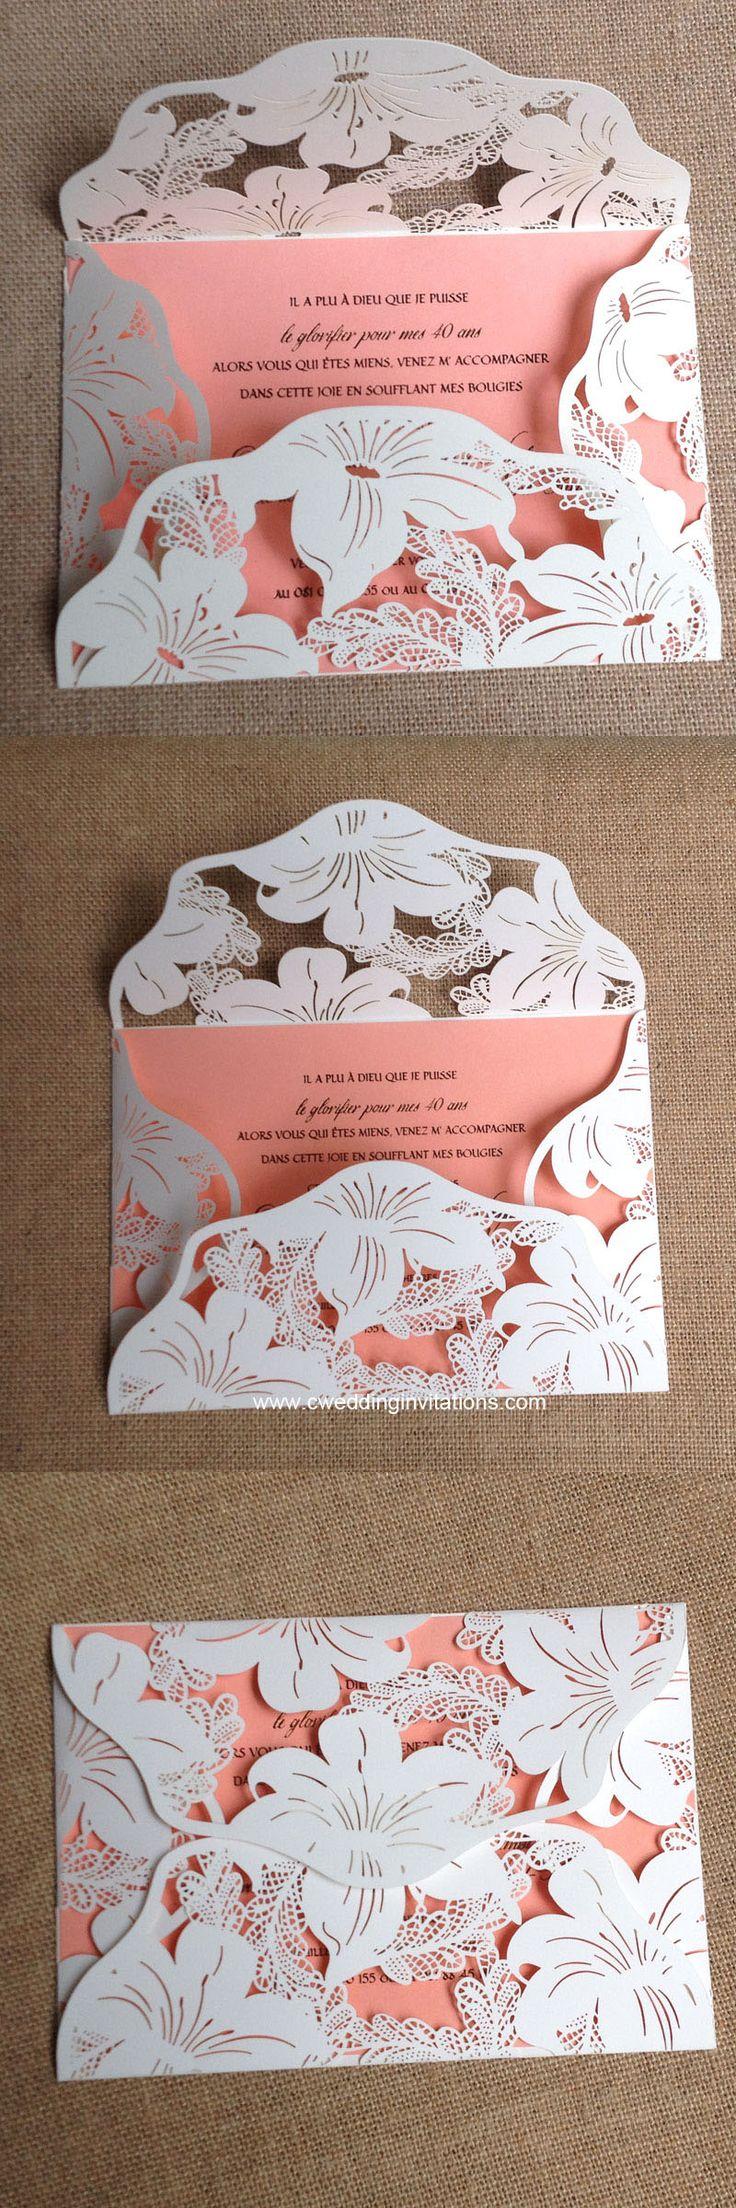 Lily blossom laser cut wedding invitations, 2016 New design laser cut wedding…